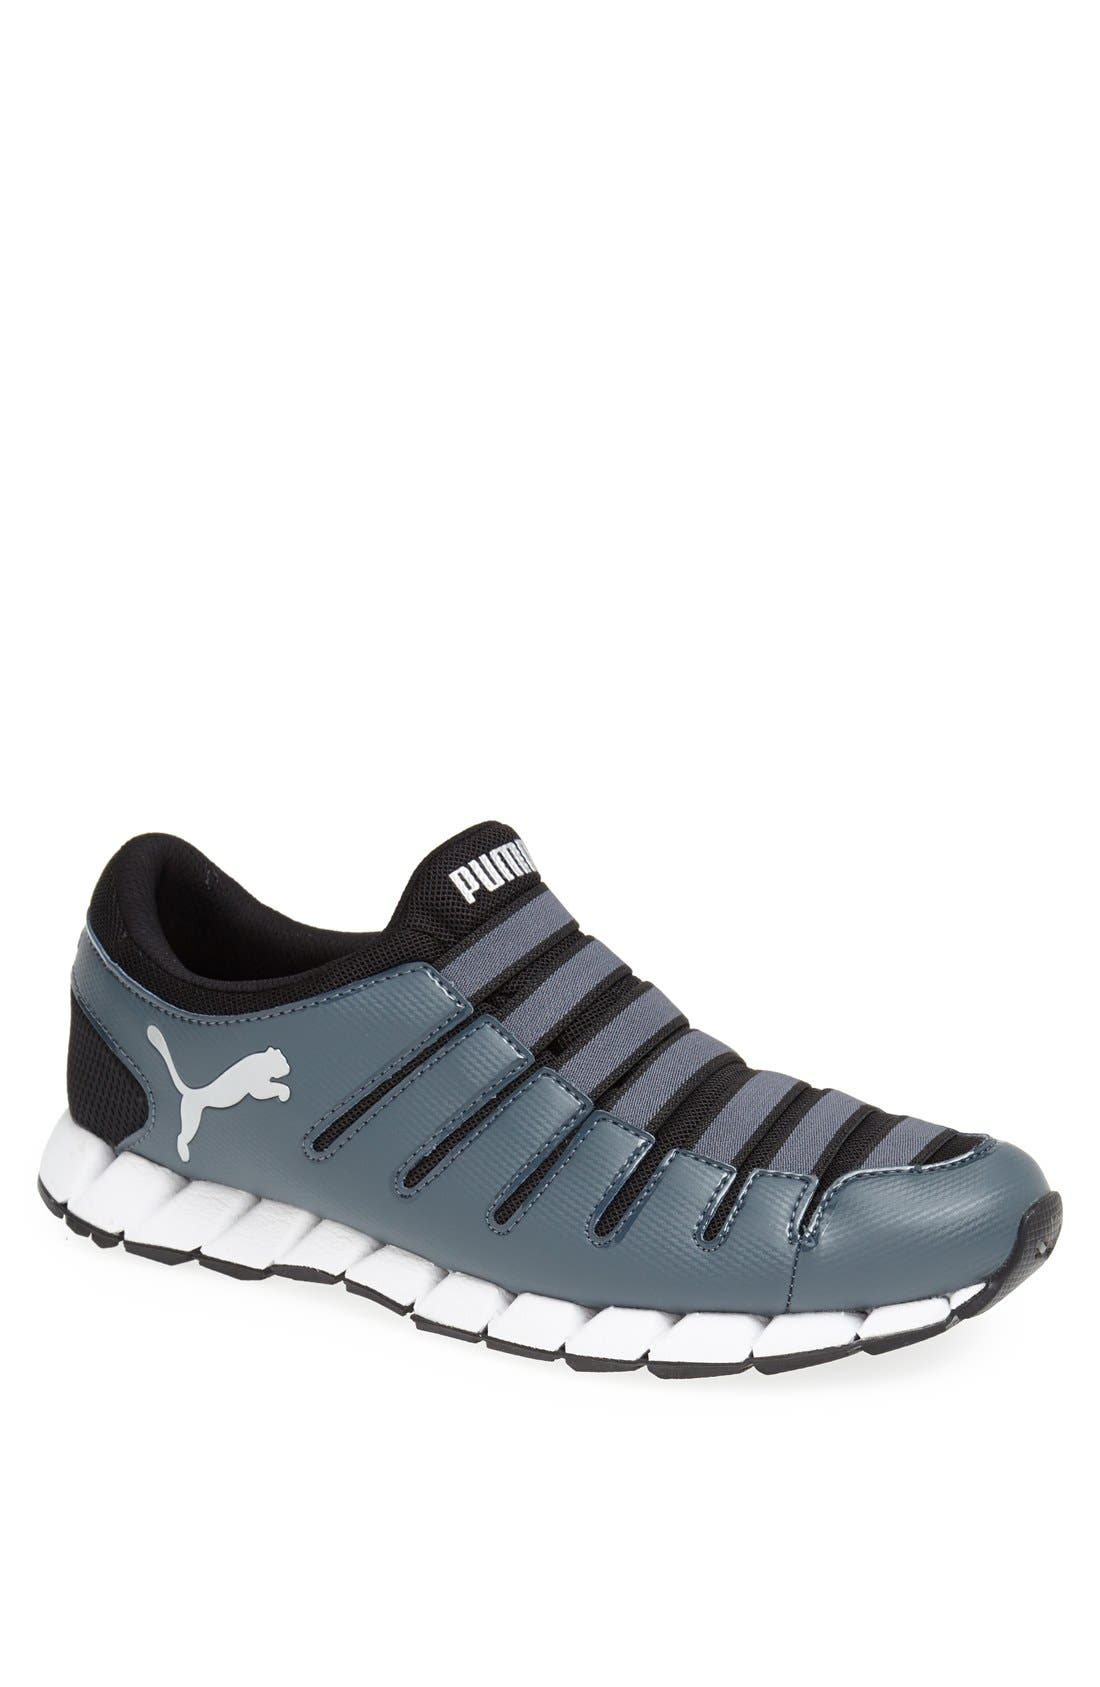 Alternate Image 1 Selected - PUMA 'Osu V3 NM' Running Shoe (Men)